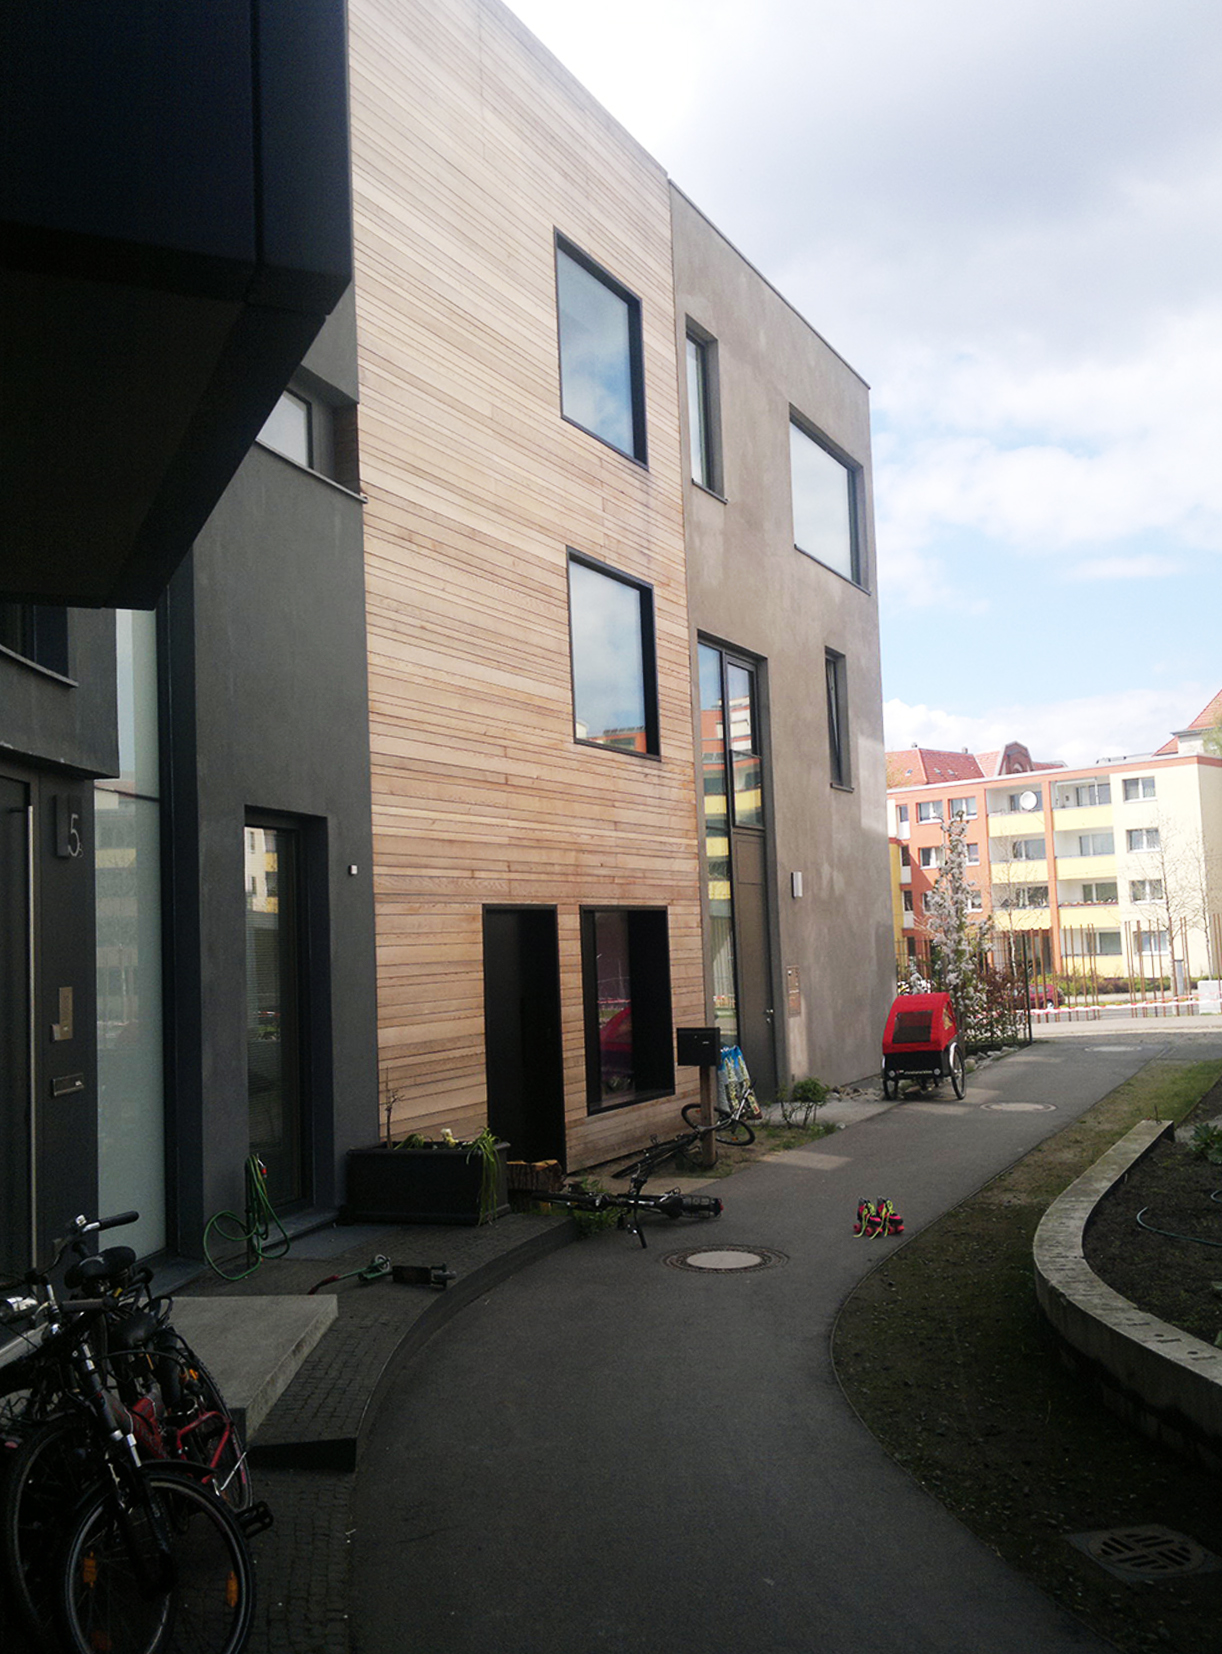 020 berlin mieszkaniowka - Berlin - Architour